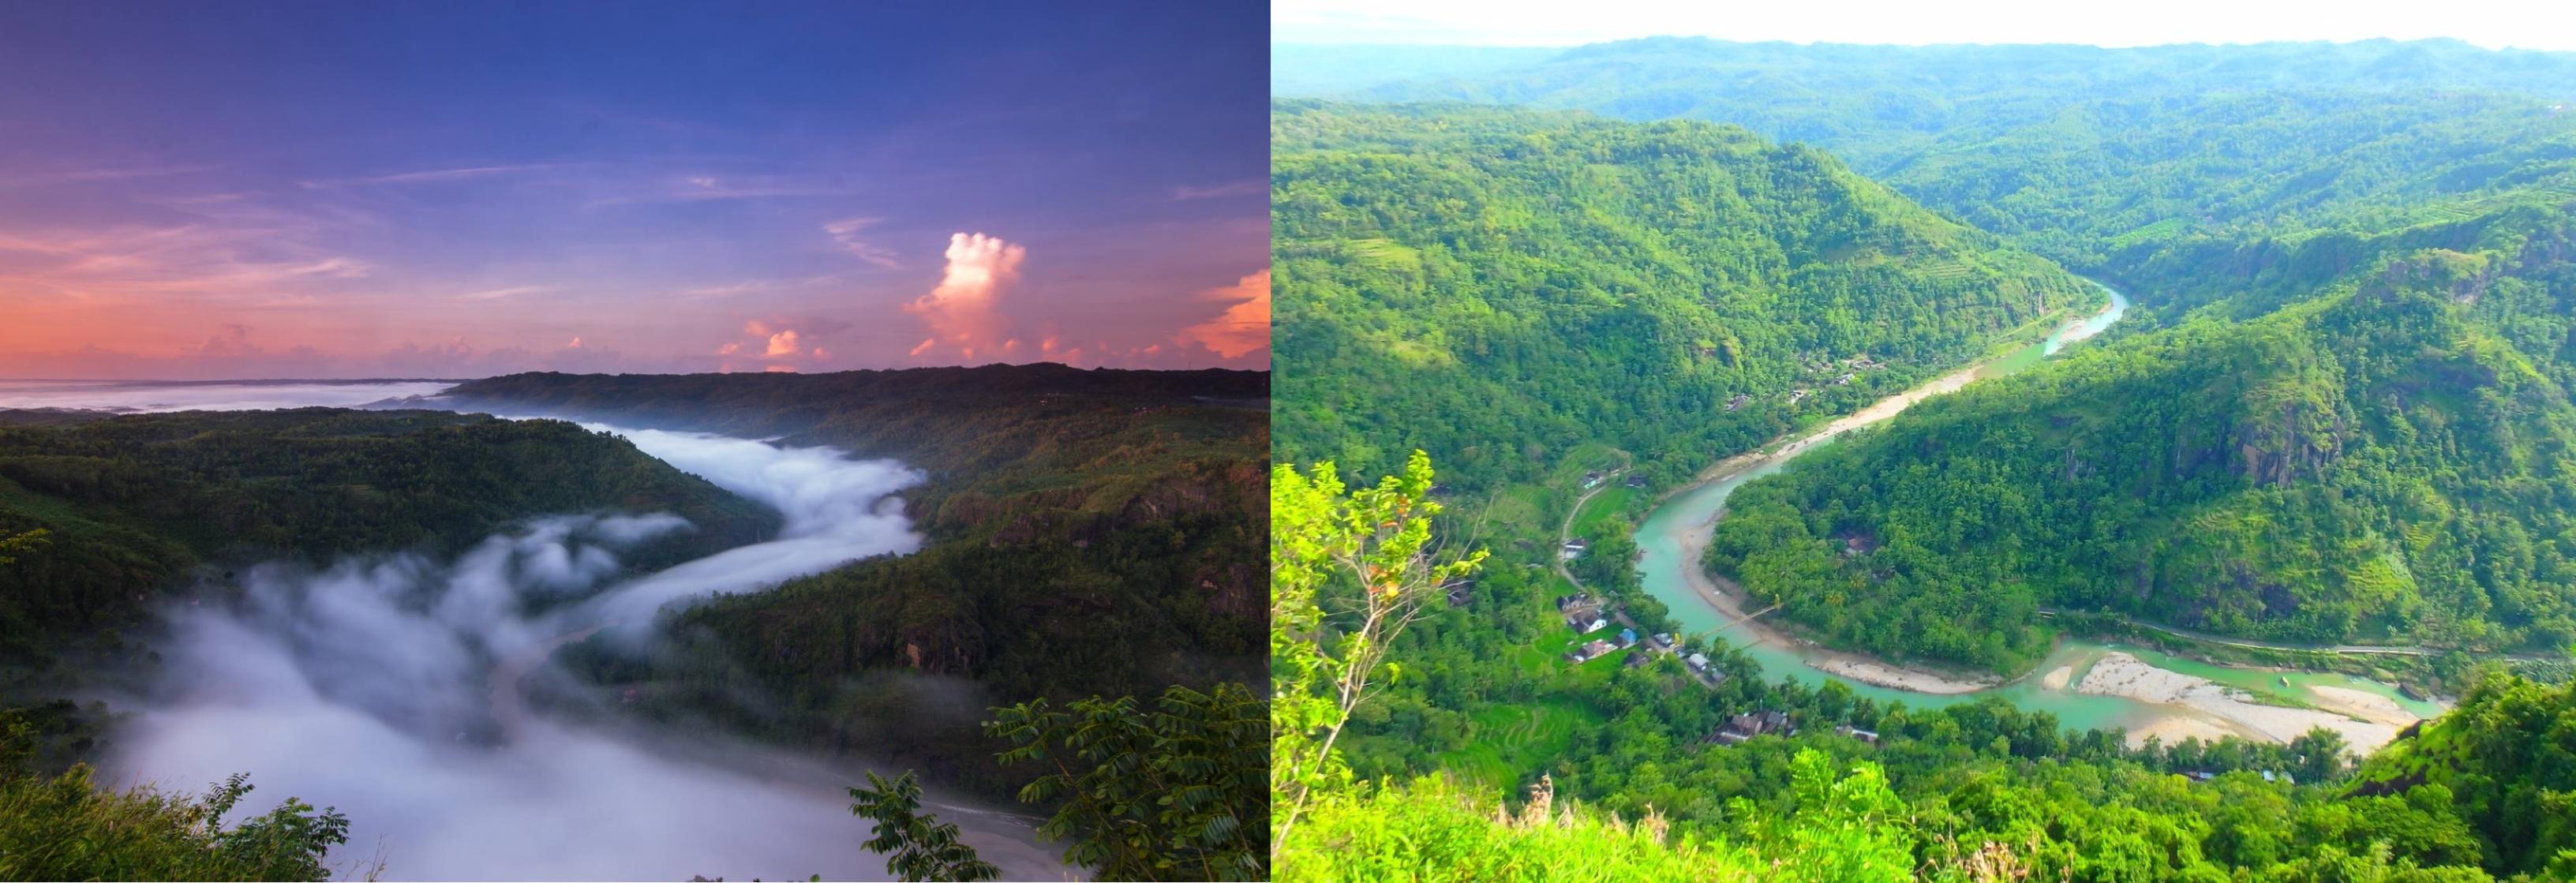 9 Unique Places To Visit In Yogyakarta For An Amazing Nature Escape Explore Jogja 2018 Image Credit Top Hariyanto K Bottom Left Kebun Buah Mangunan Right Palup15